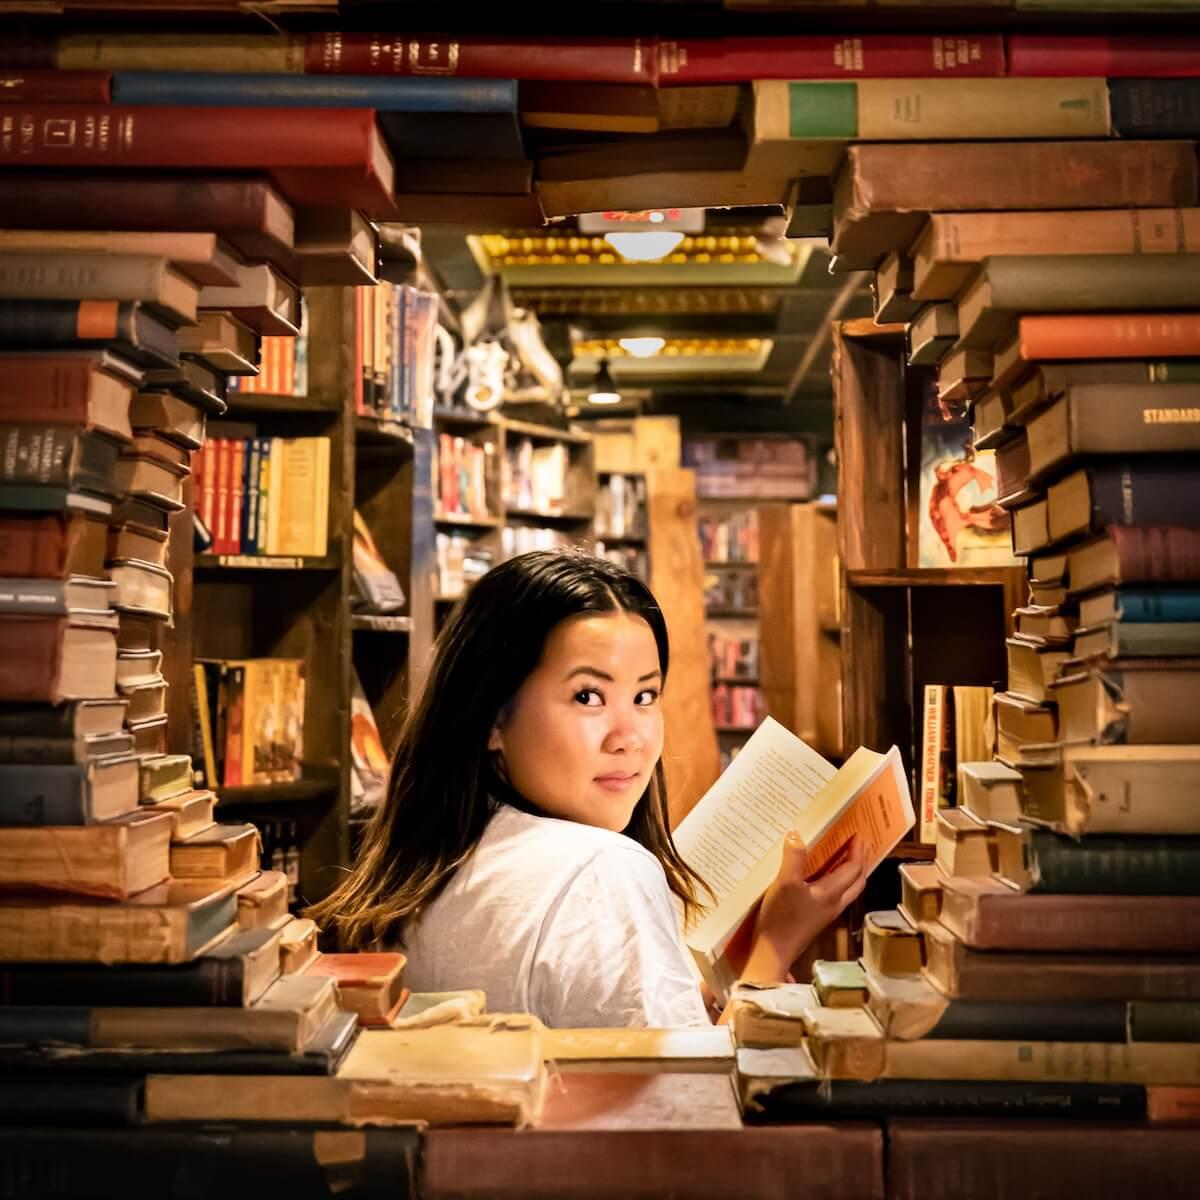 unsplash-francisco-delgado-woman-looking-back-through-stack-of-books